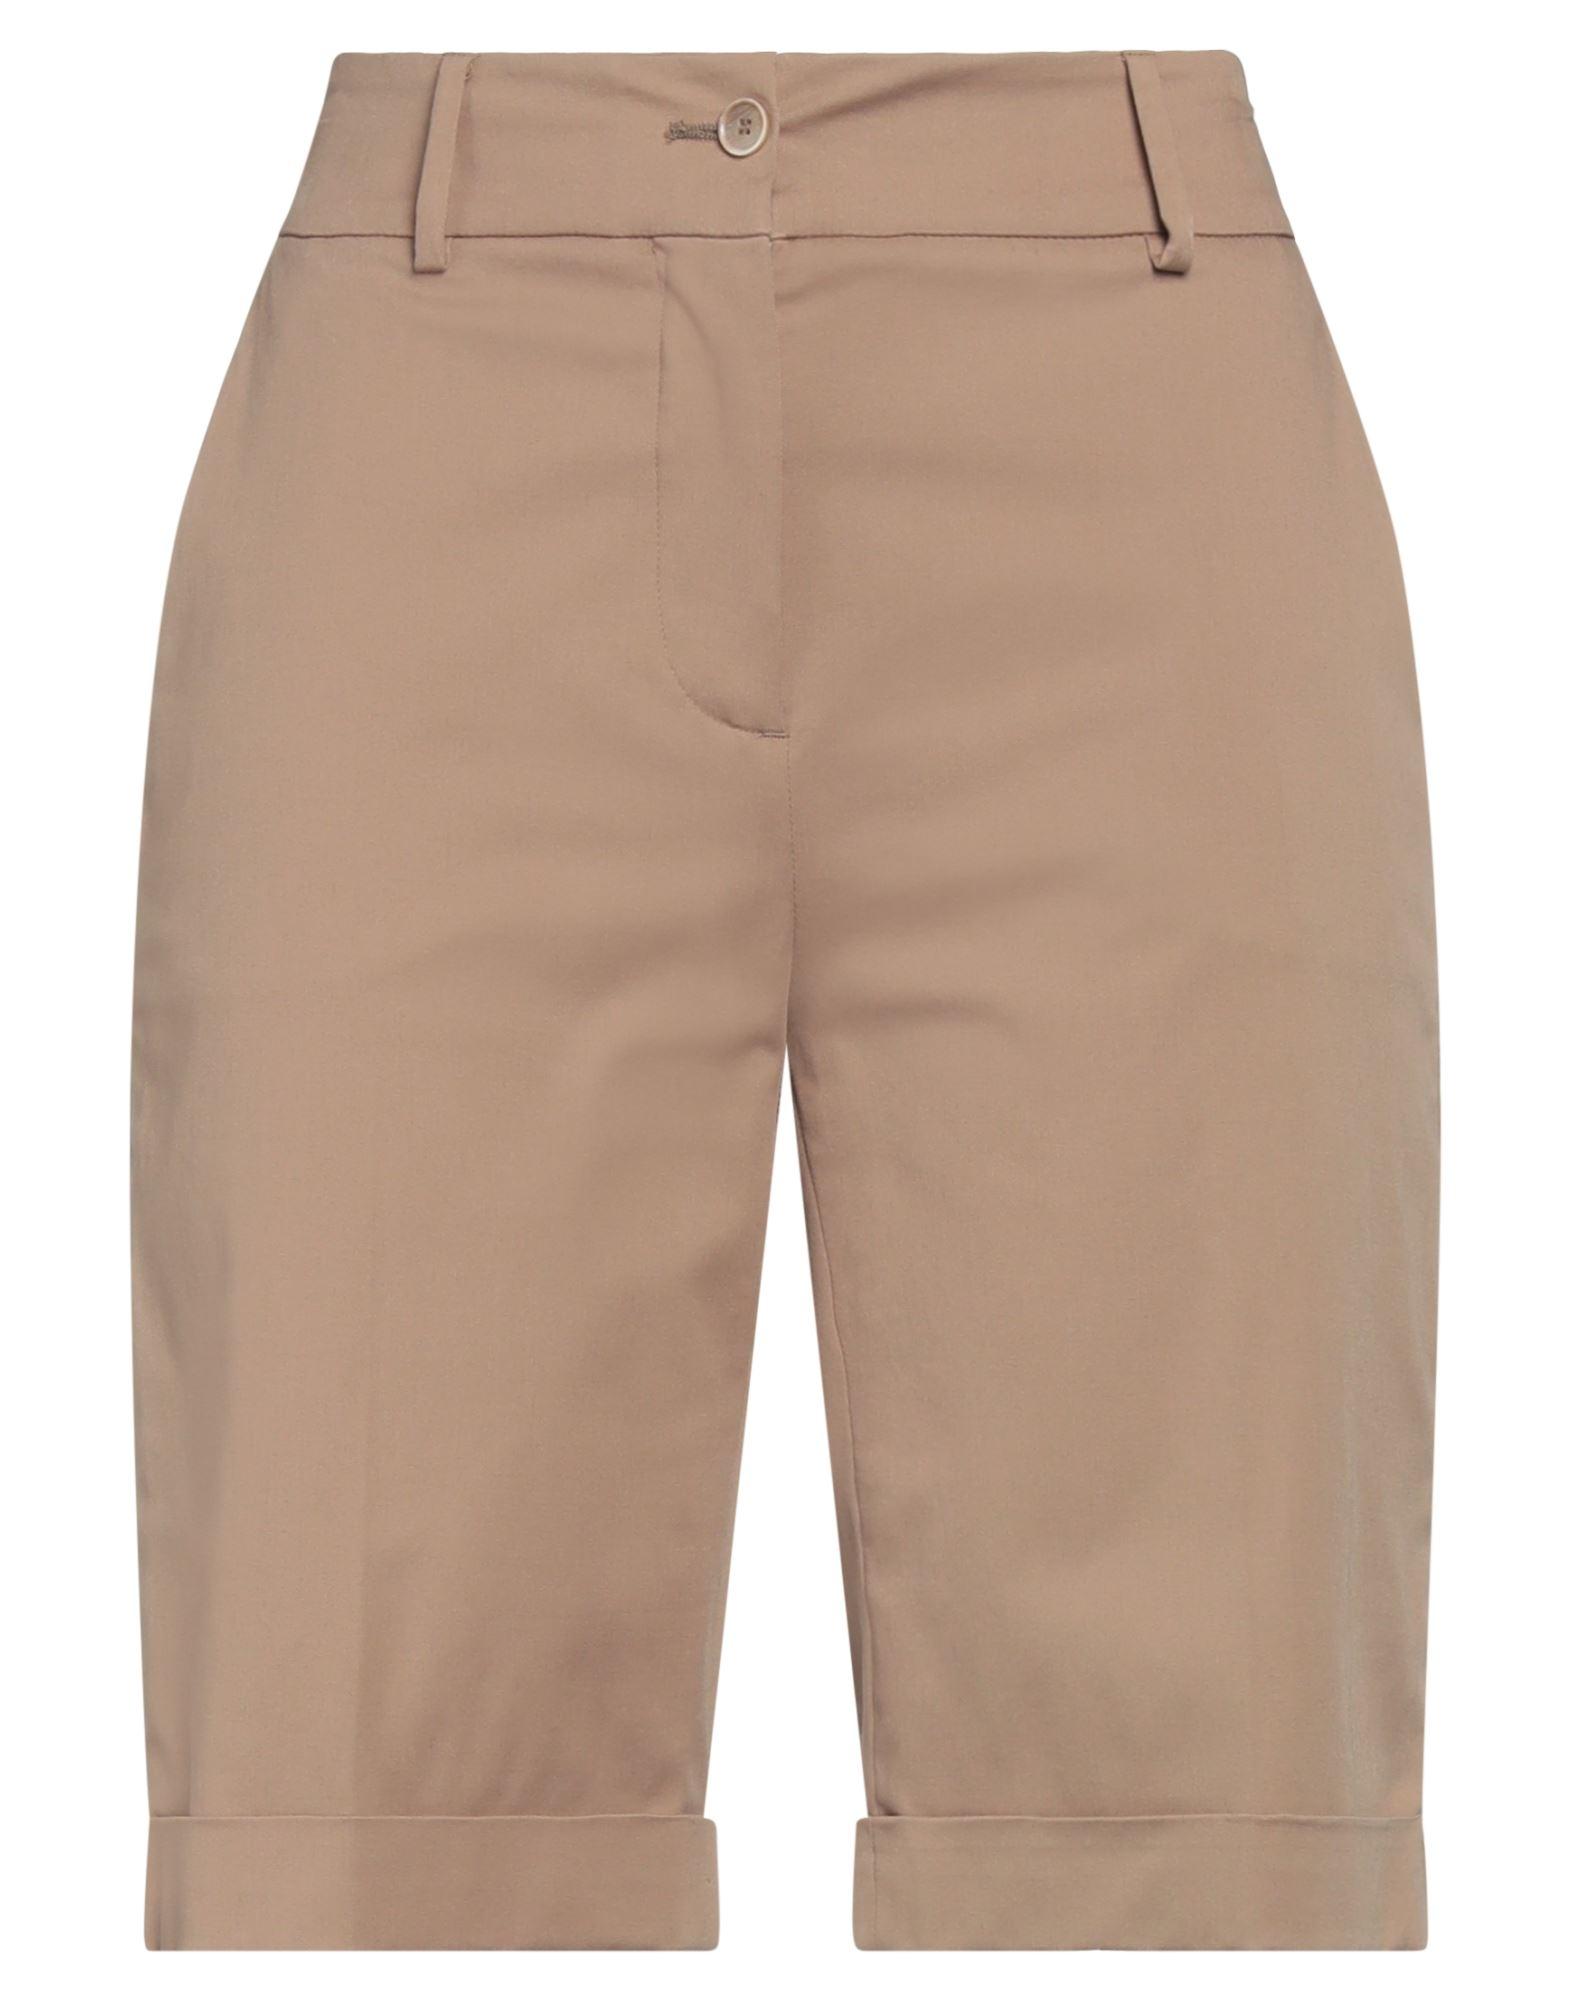 ELEVENTY Shorts. plain weave, no appliqués, solid color, high waisted, regular fit, straight leg, button, zip, multipockets, cuffed hems, stretch. 95% Cotton, 5% Elastane